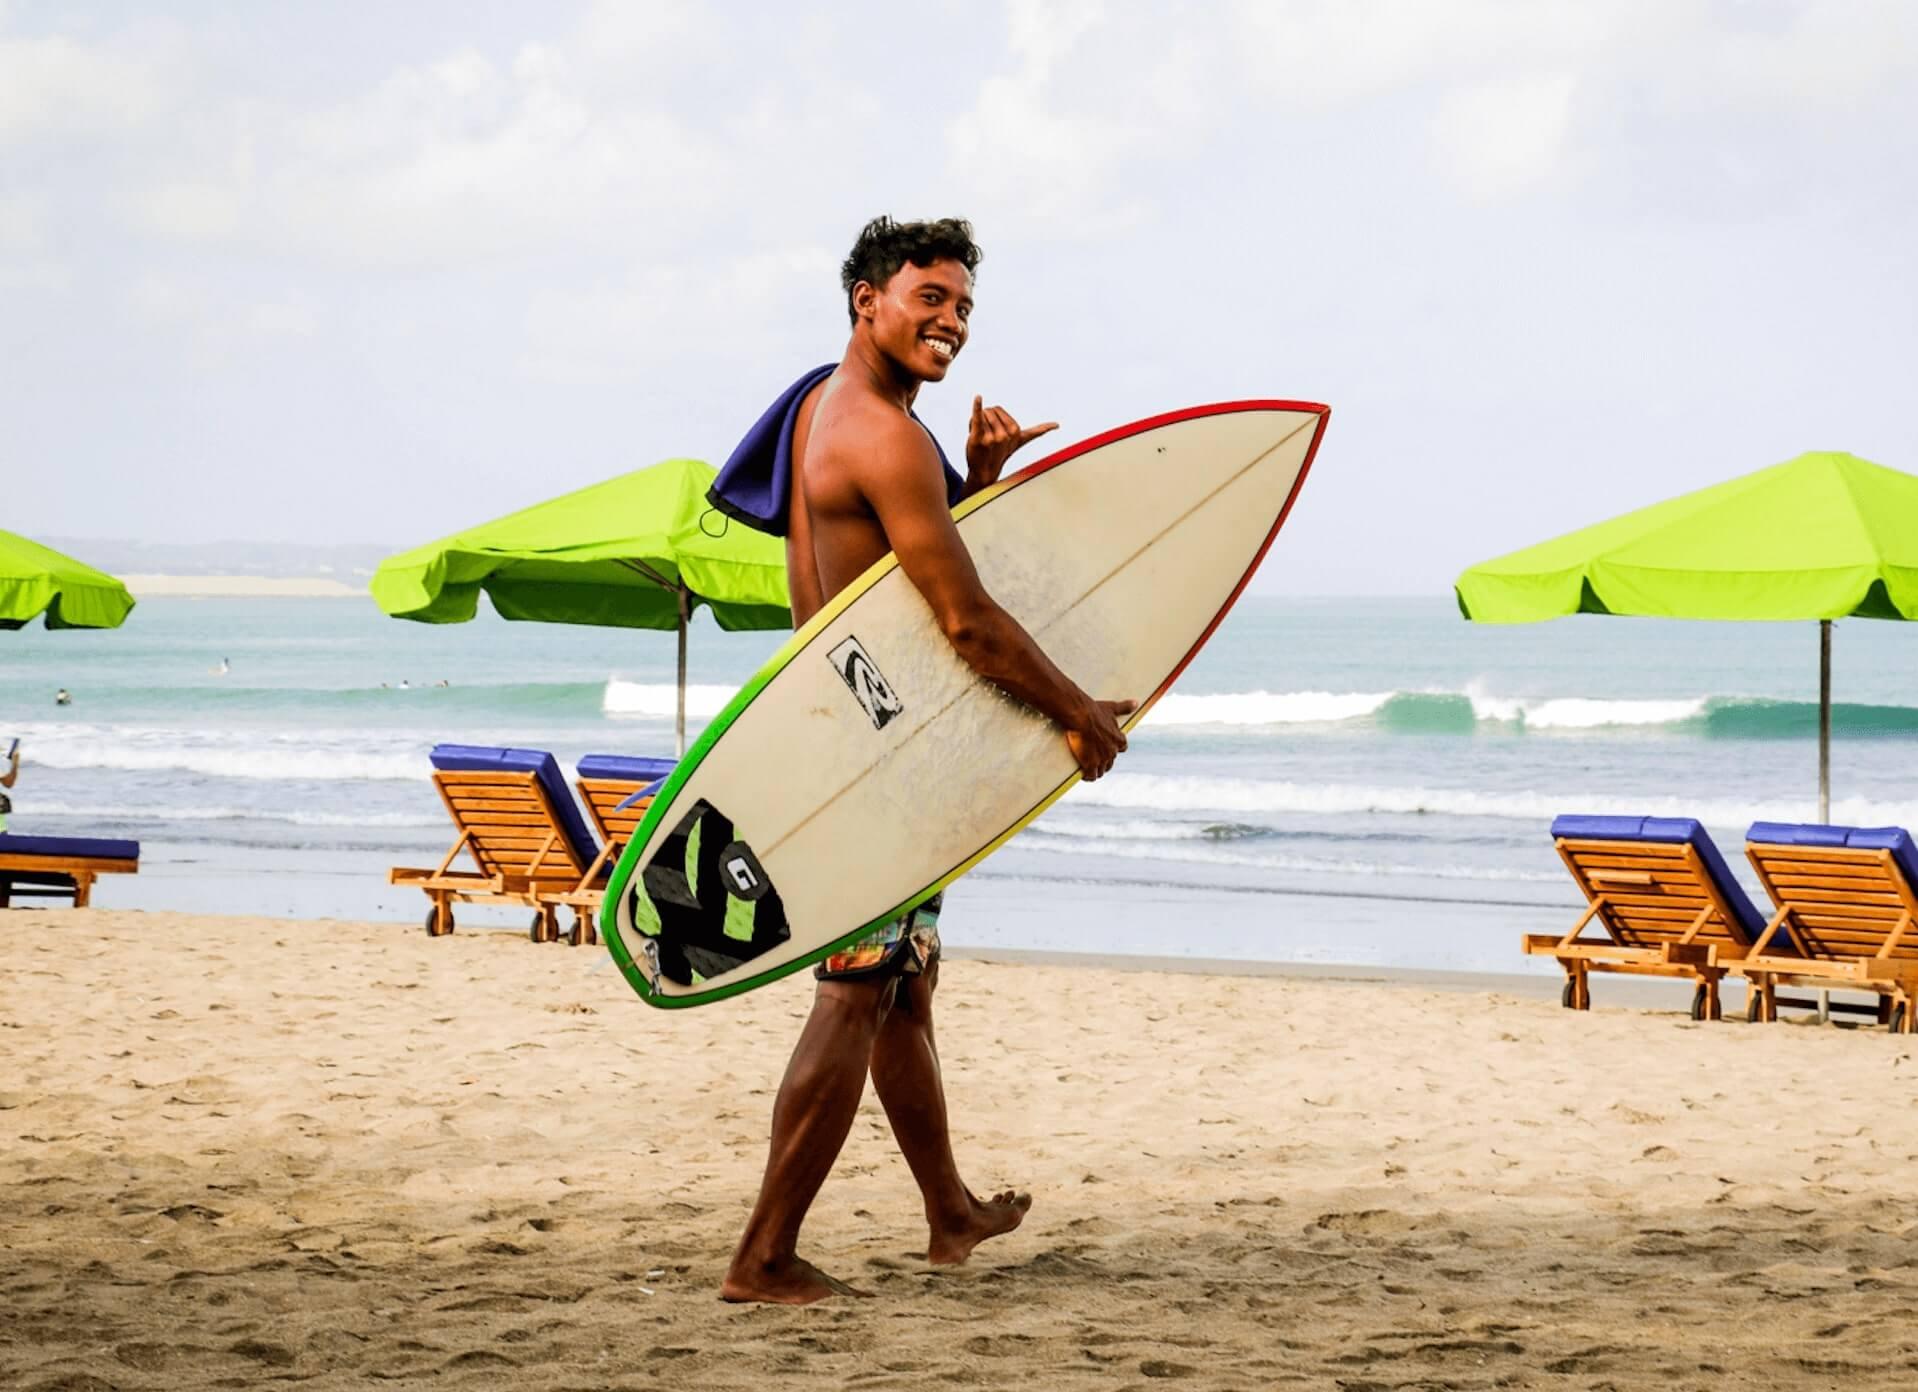 Surf schule Bali Surf guide Ronaldo SurfWG